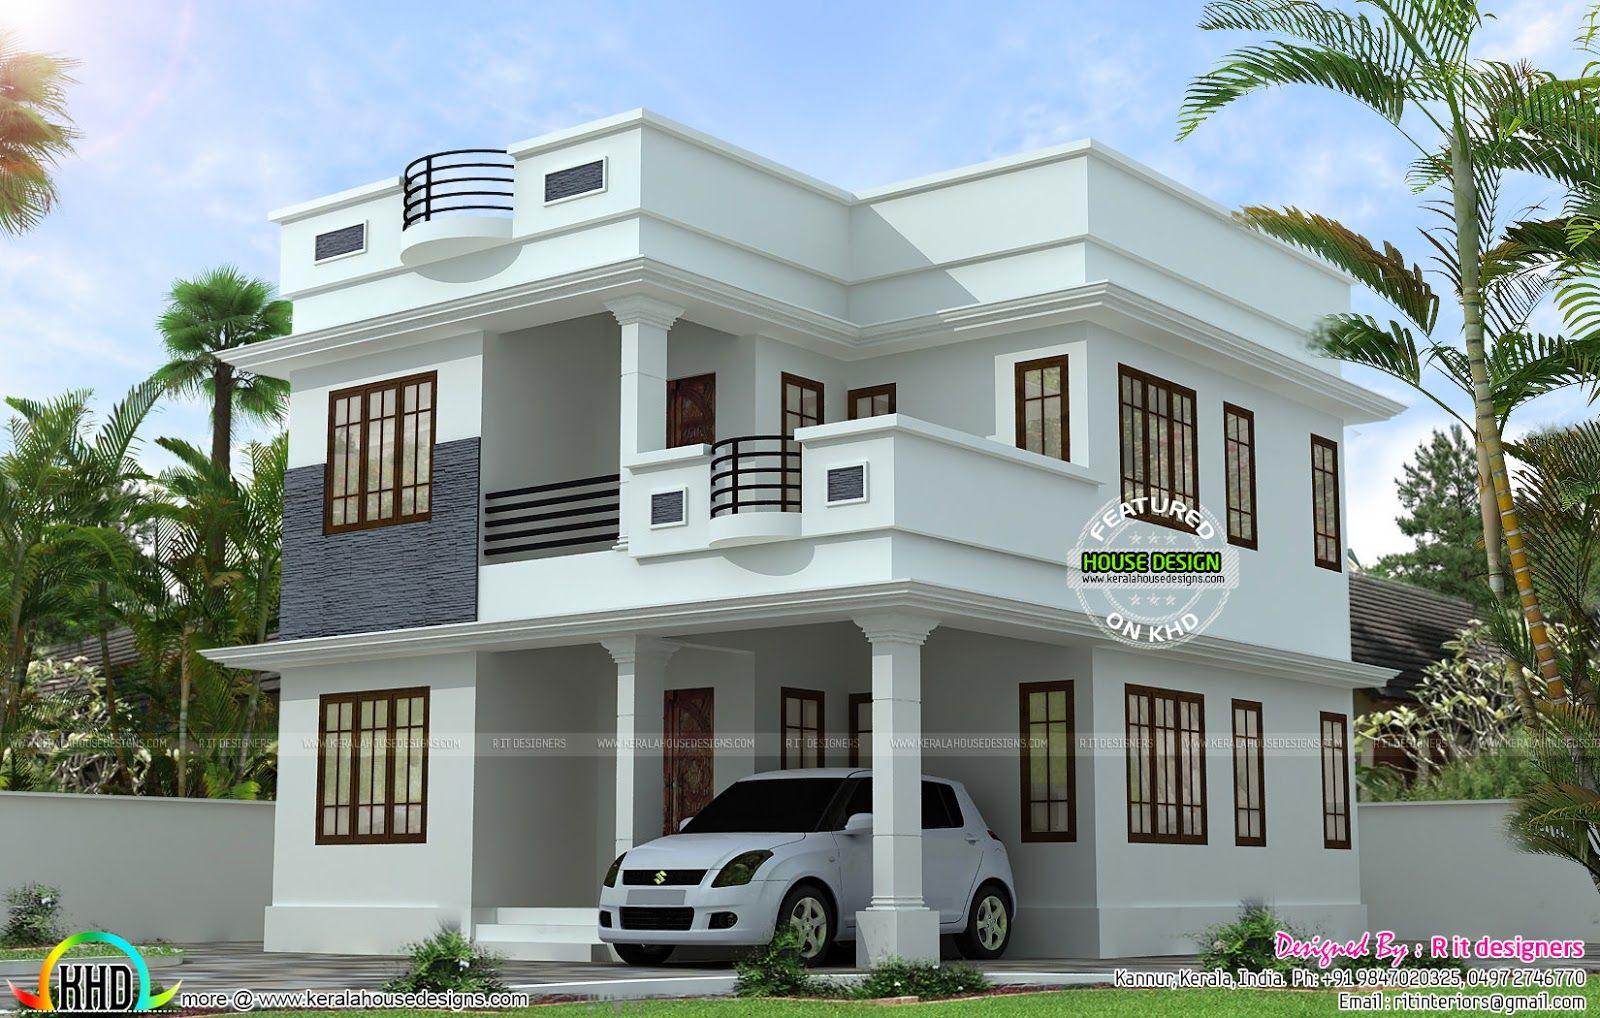 Home Design Decor Kerala House Design Bungalow House Design